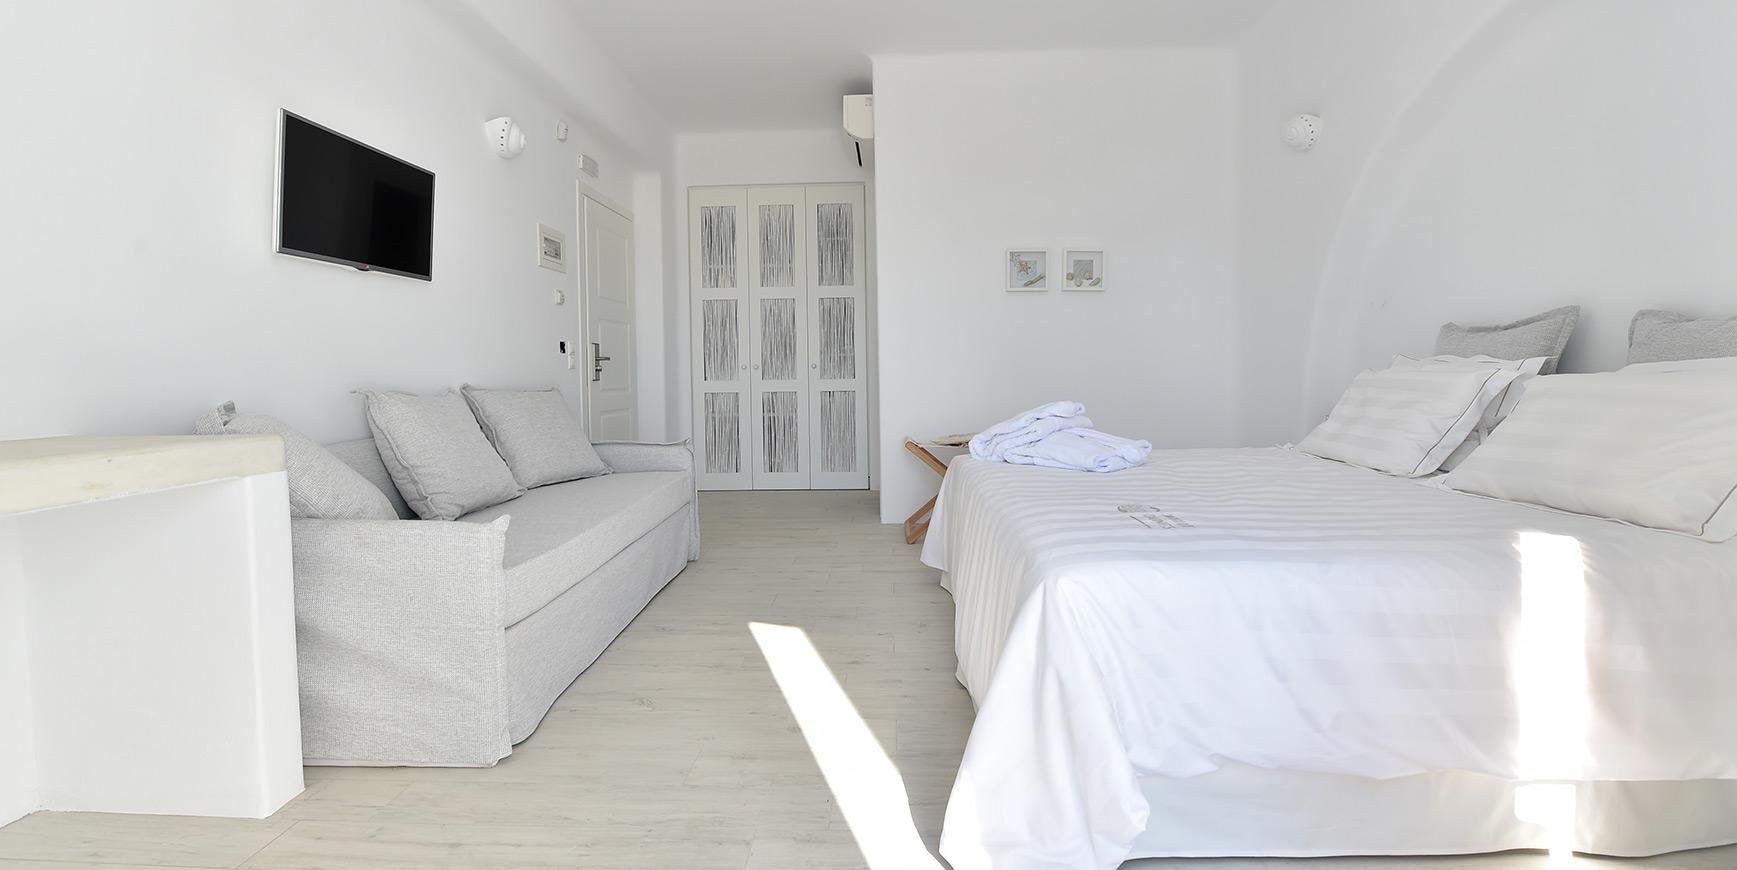 Luxury Room in Paros